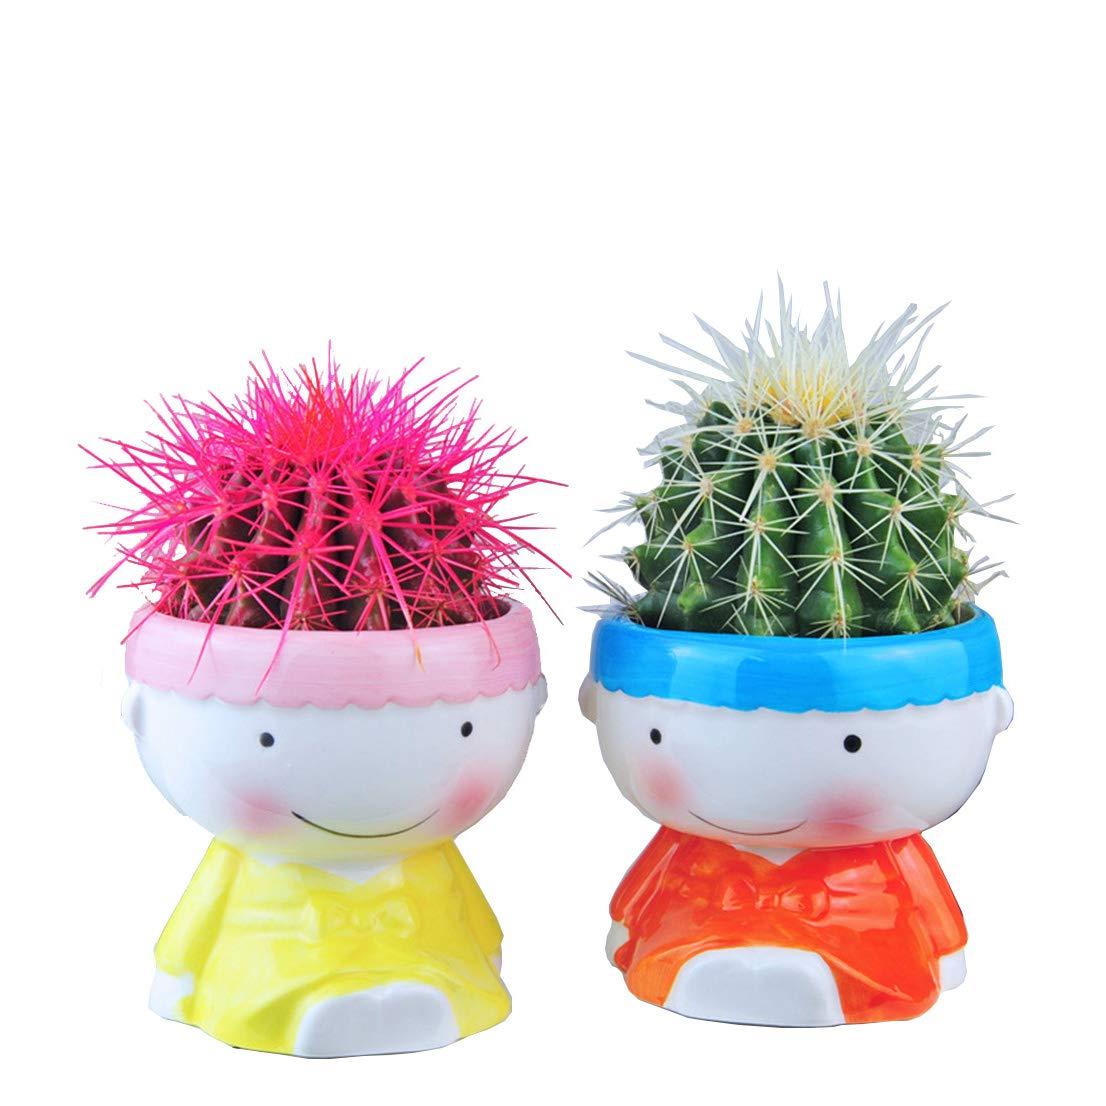 Youfui Home Decor Pot, Succulent Planter Flowerpot Decor for Home Office Desk (Boy&Girl)